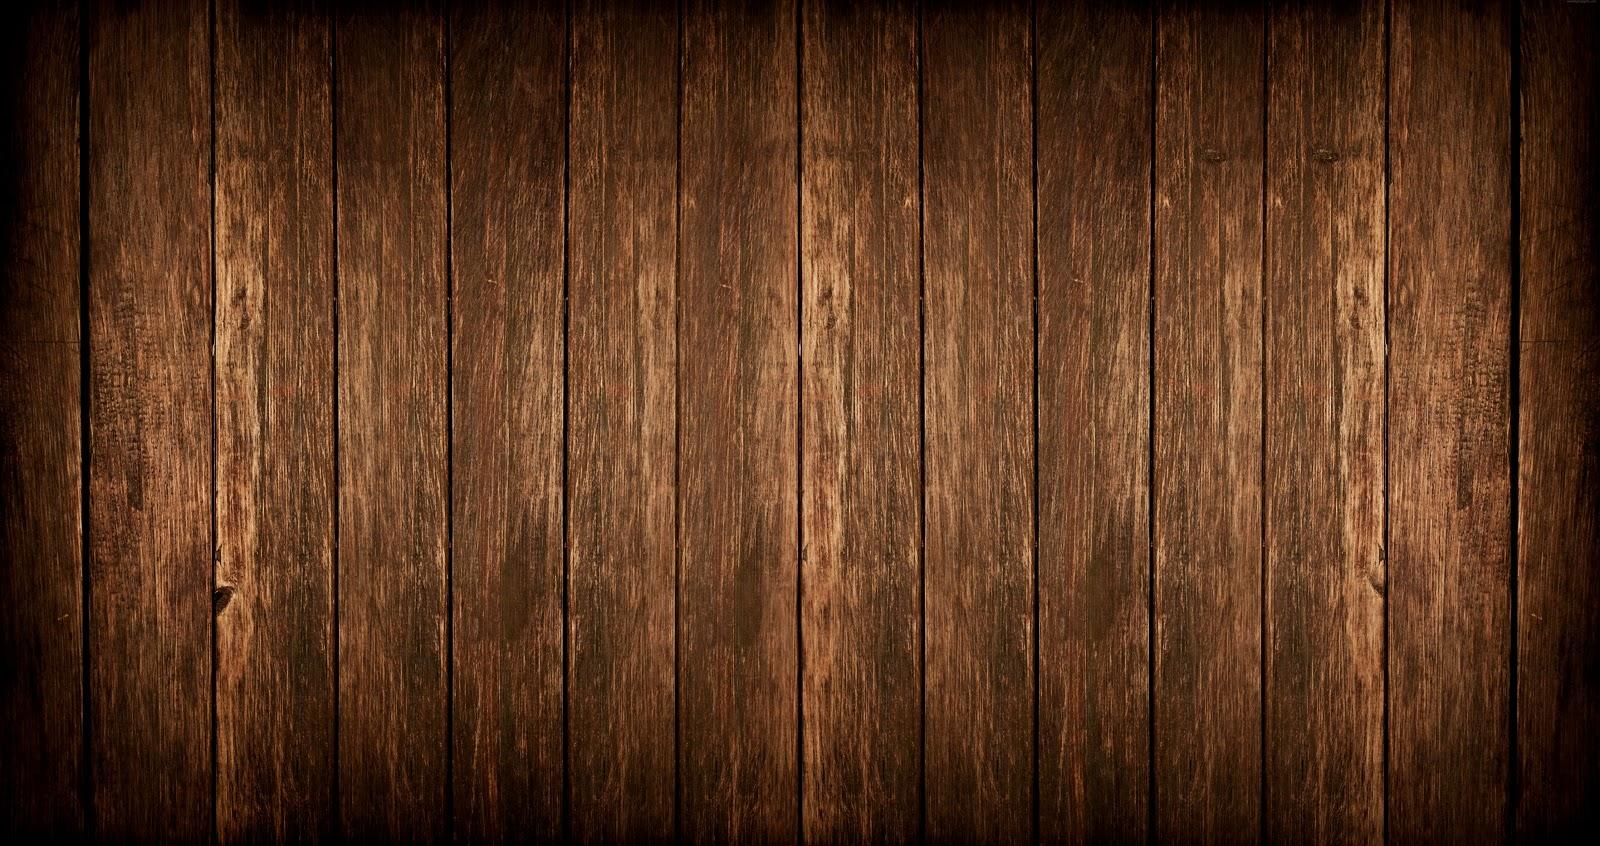 Download Wallpaper High Resolution Wood - high-resolution-wood-panels  Pic_674785.jpg